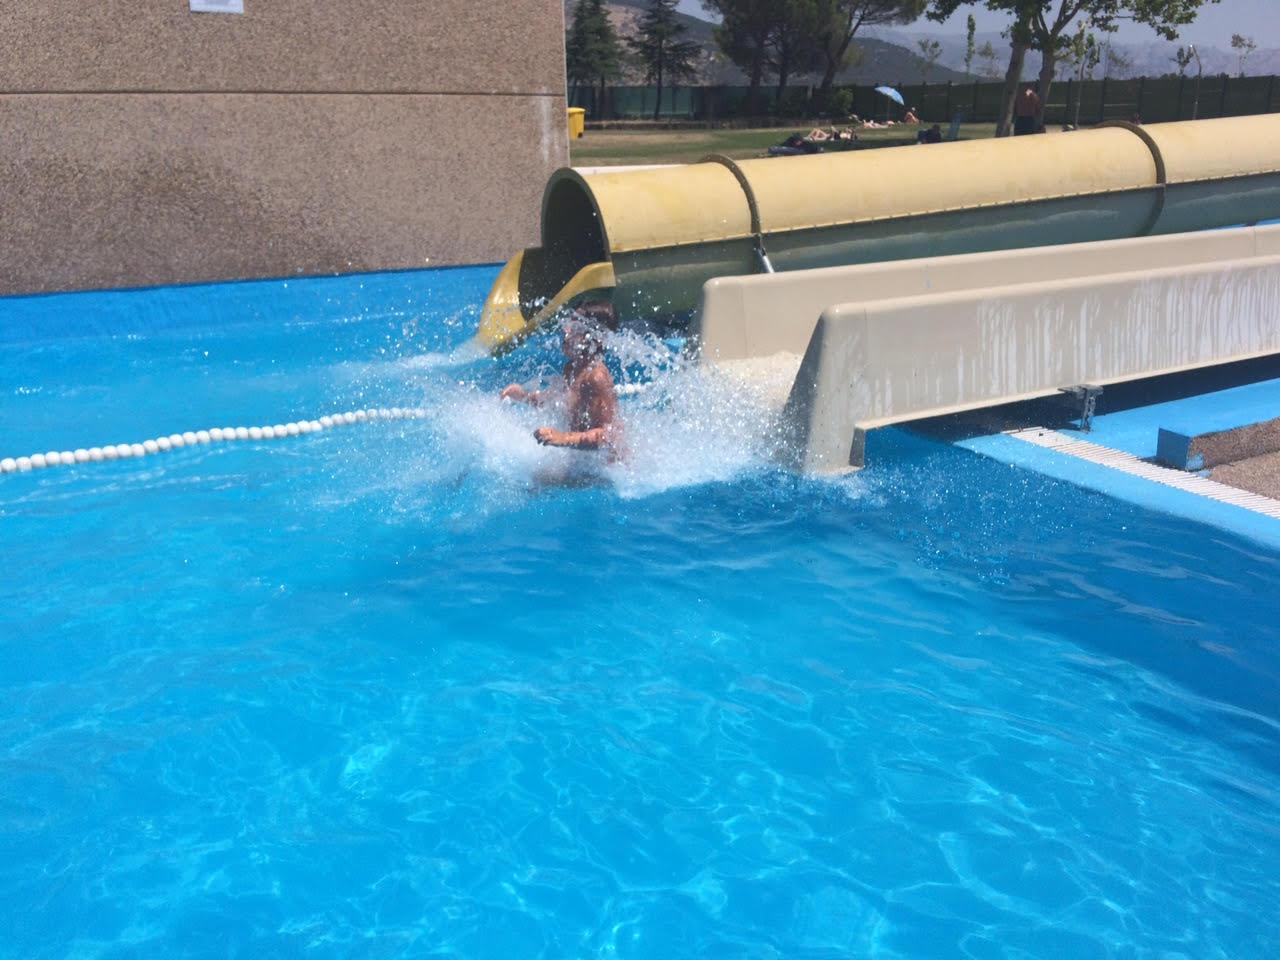 Fotos de piscinas con toboganes aqua natura with fotos de for Toboganes para piscinas